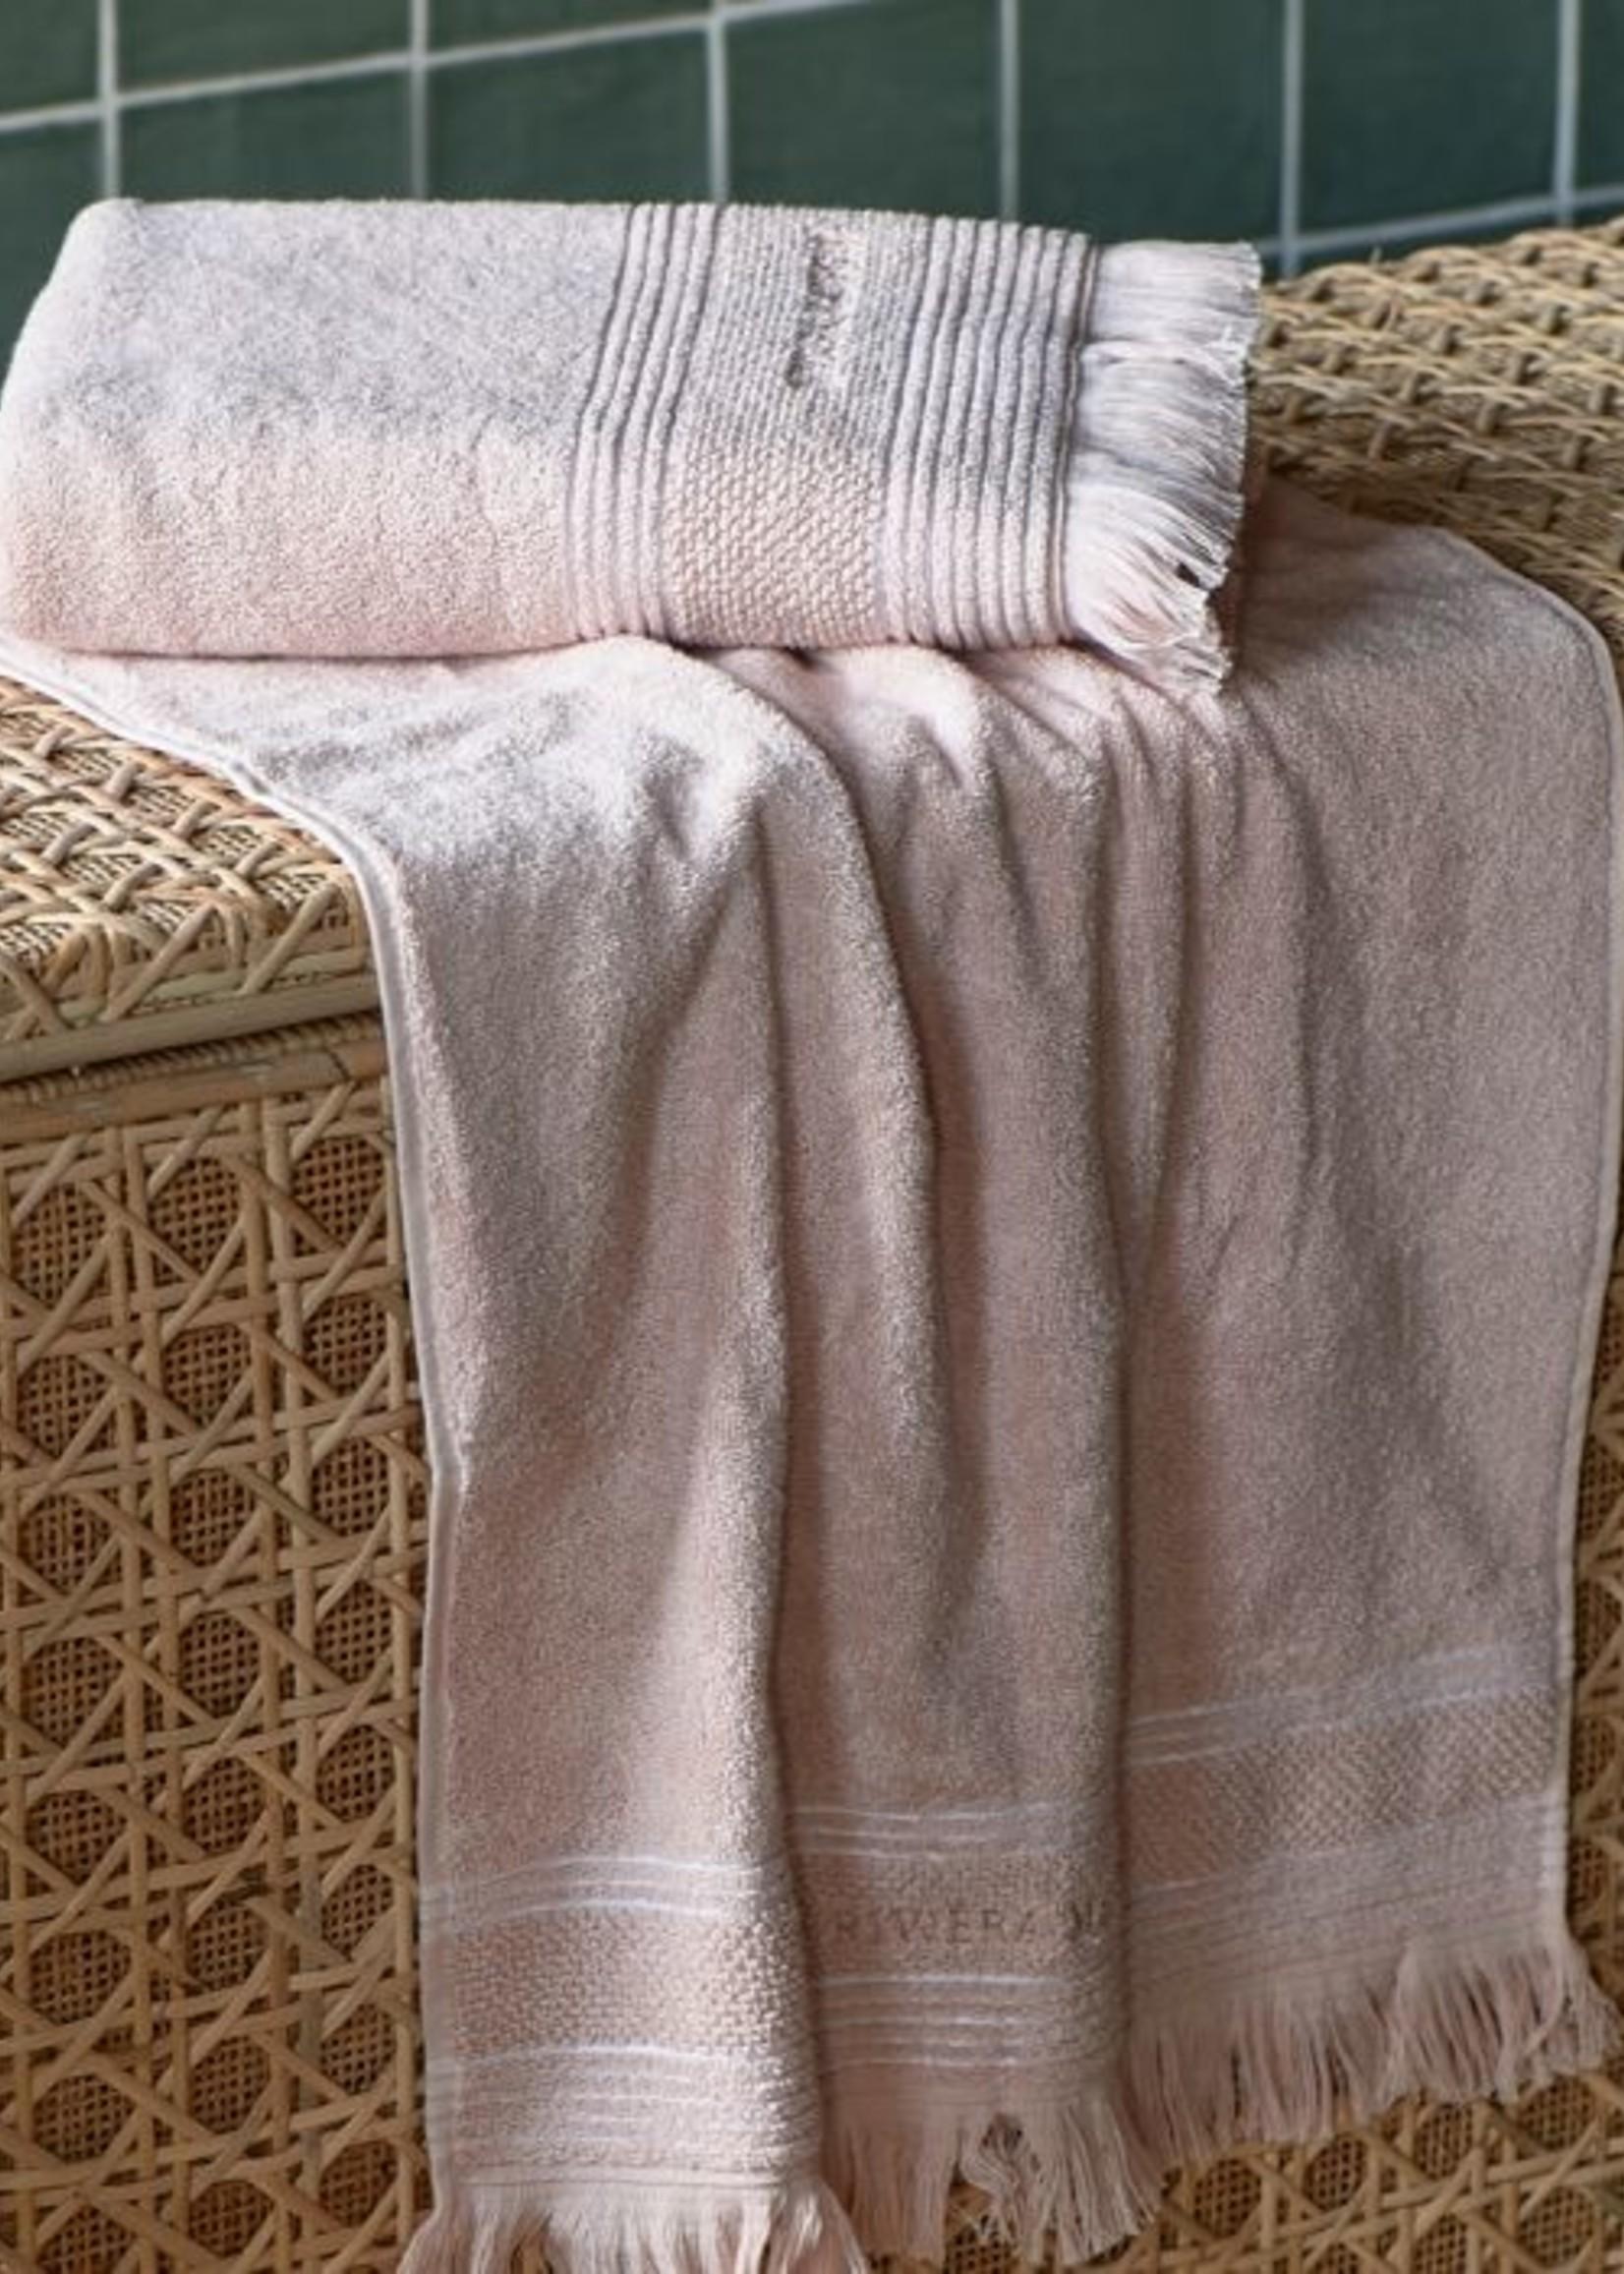 Riviera Maison Serene Towel blossom 100x50